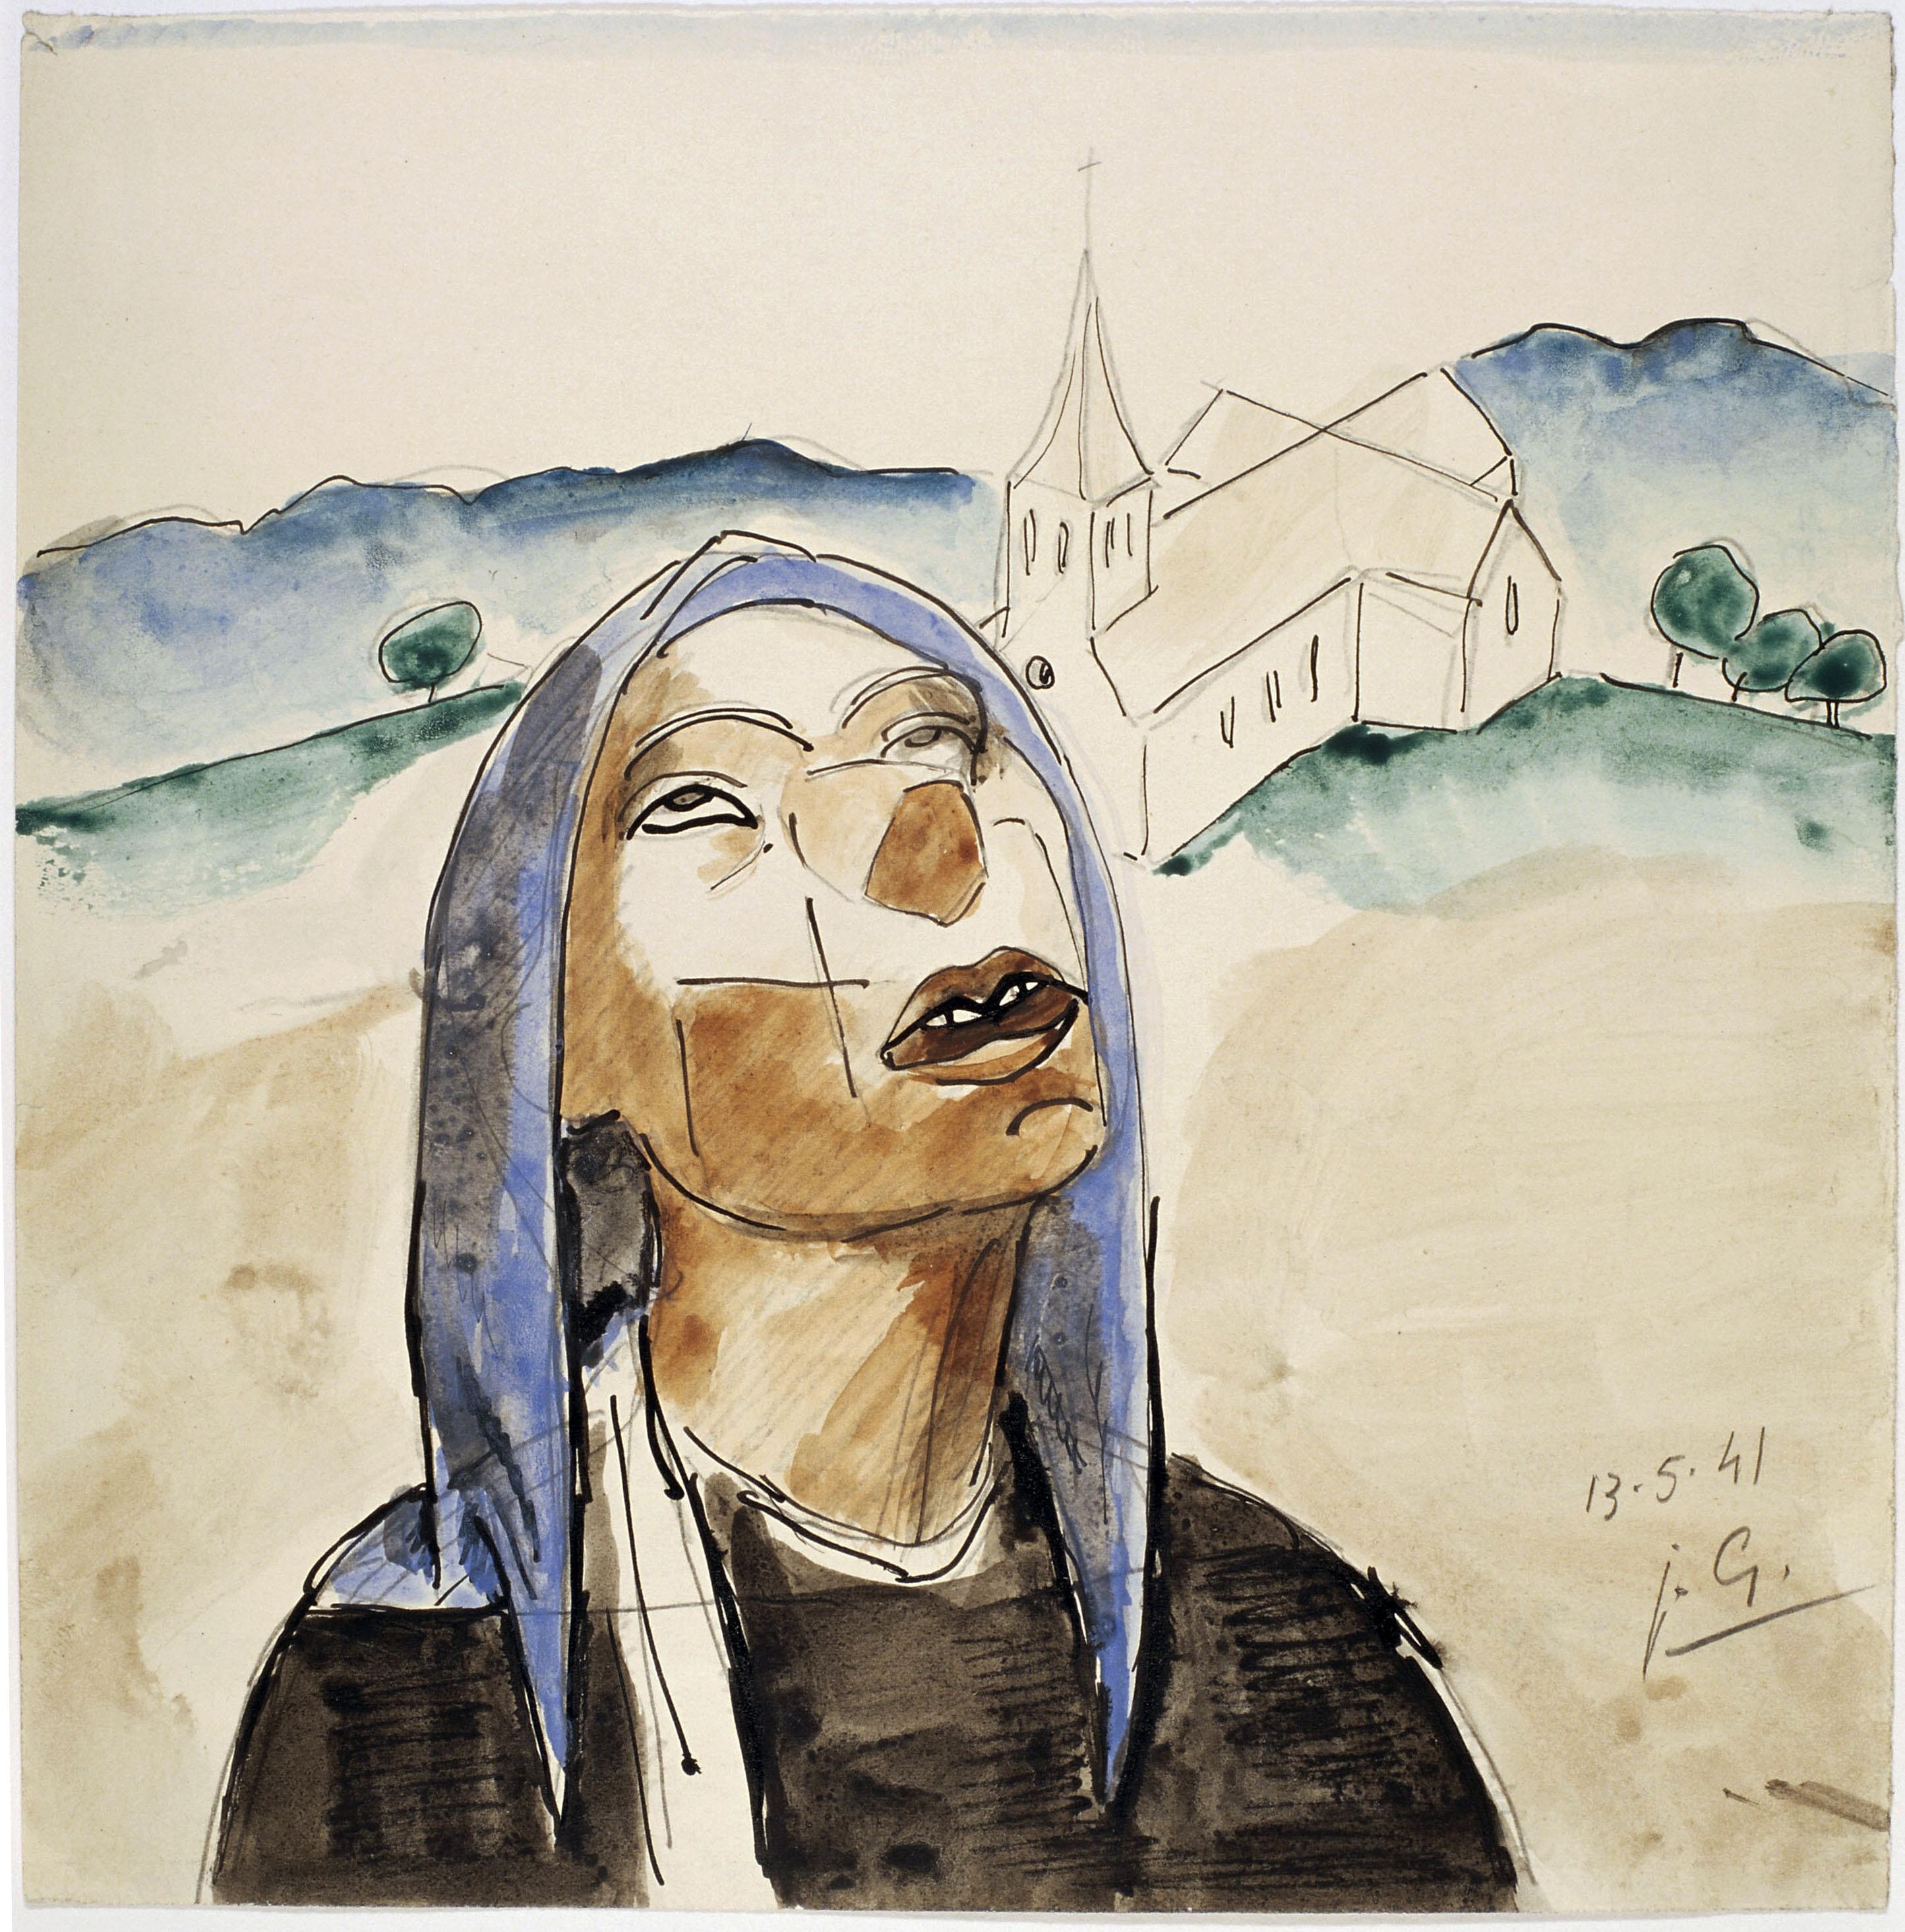 Juli González - Bust femení i campanar (Visage au clocher) - 1941